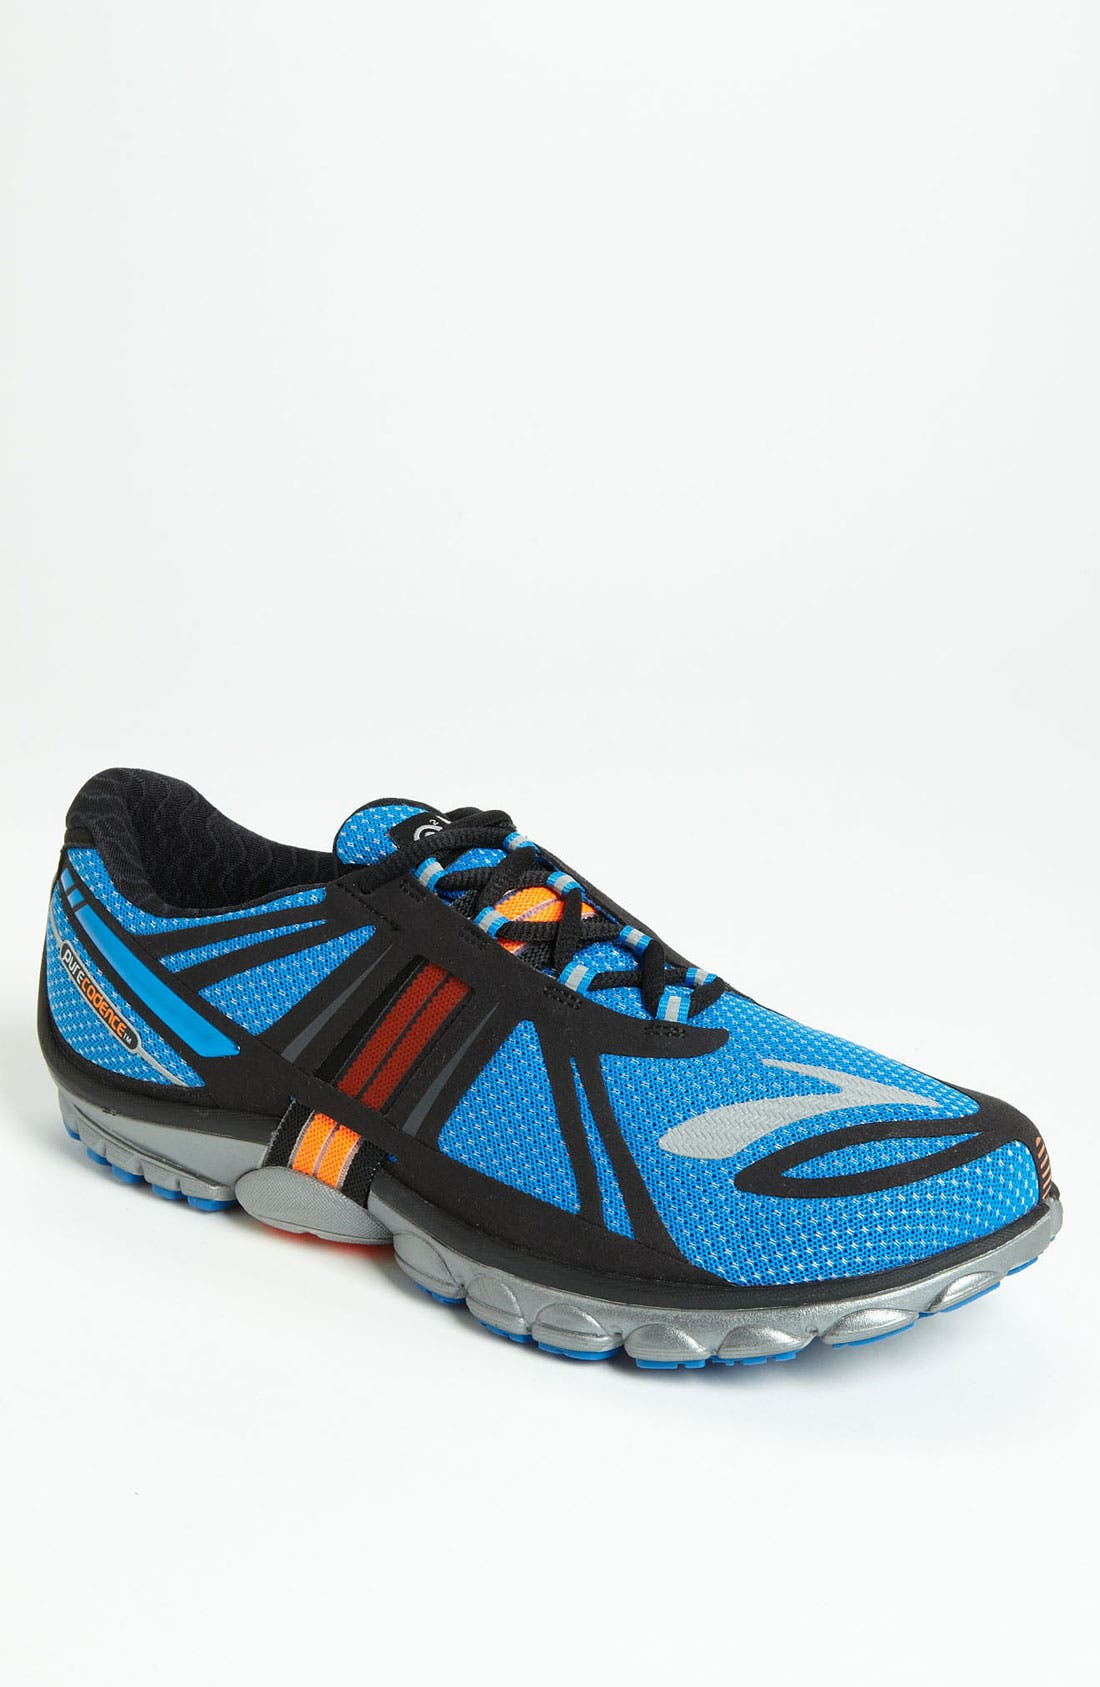 Alternate Image 1 Selected - Brooks 'PureCadence 2' Running Shoe (Men)